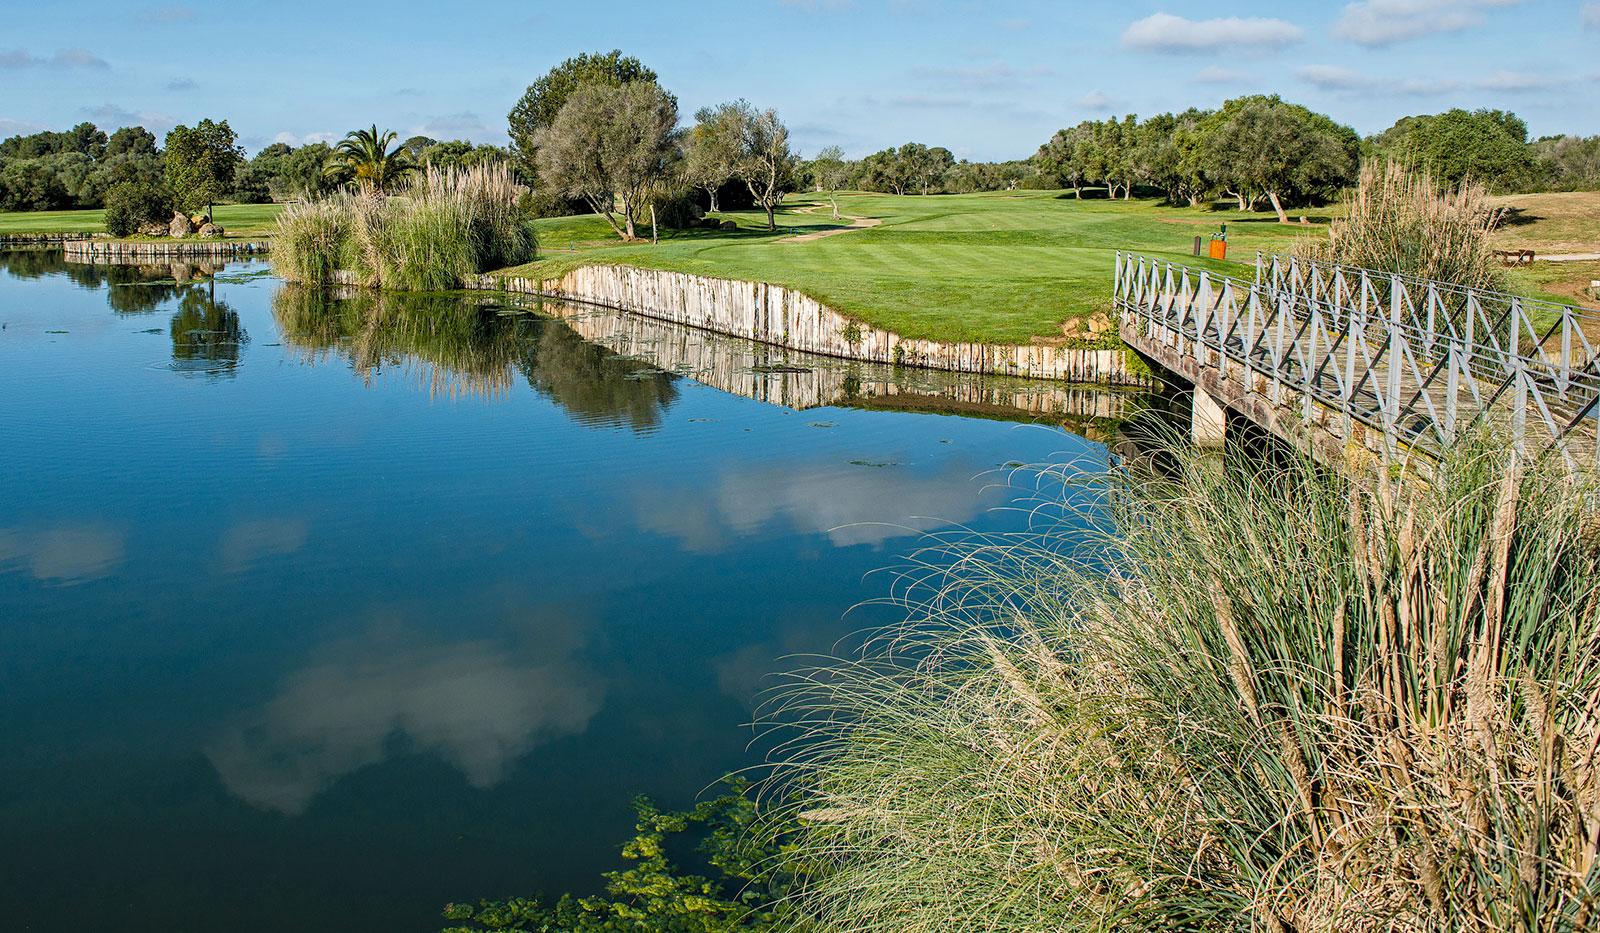 marriott golf son antem mallorca spain east course 19725284128 o - Be Live Collection Son Antem - Mallorca